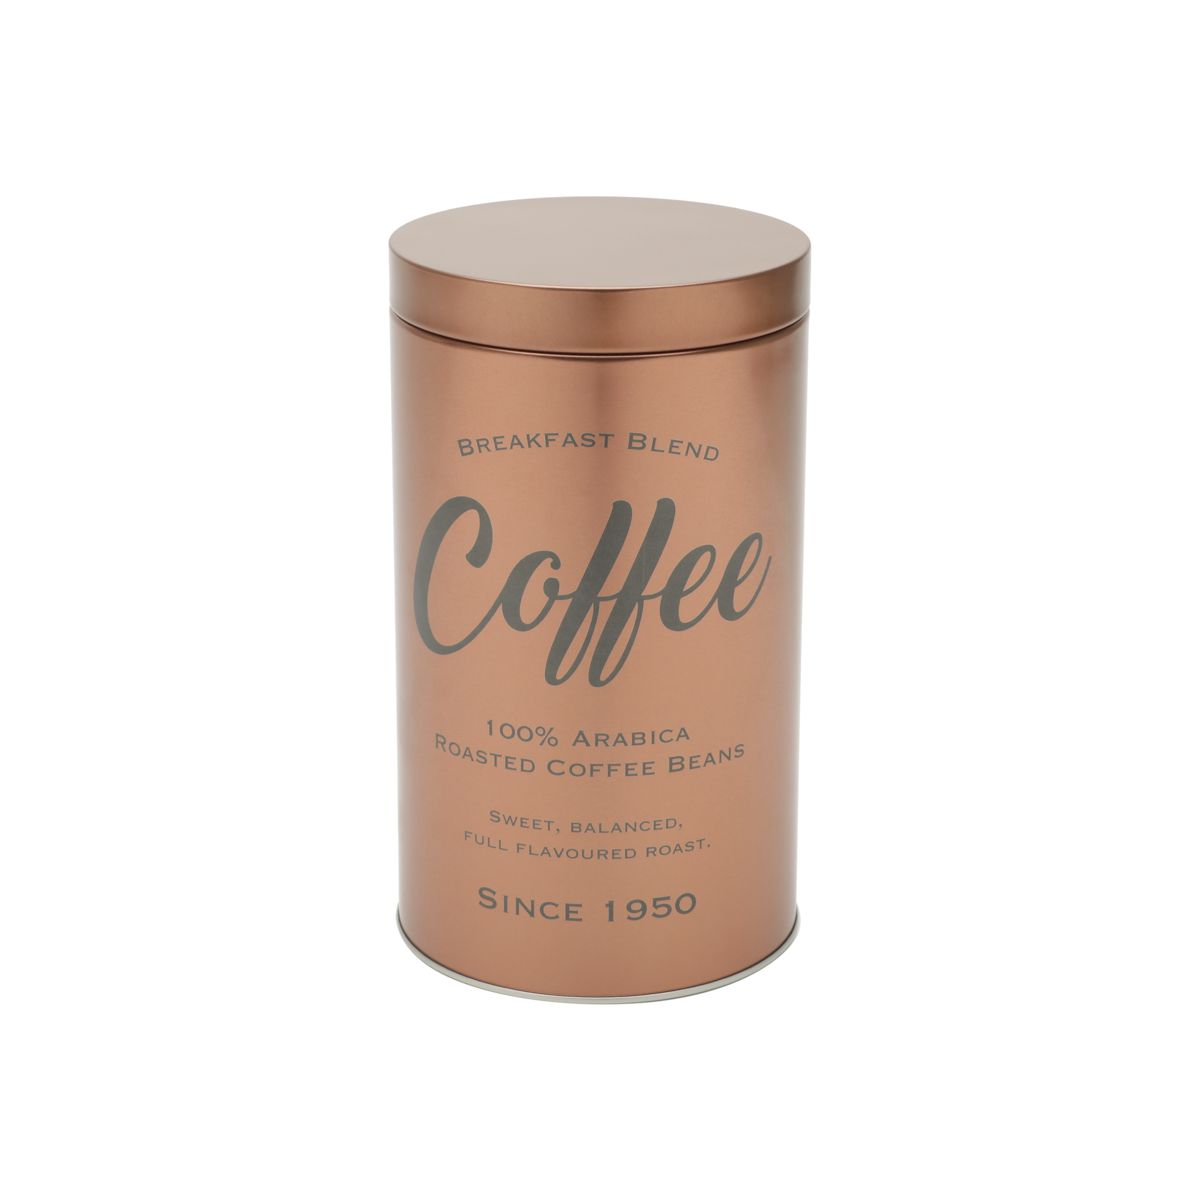 LATA METAL HERMÉTICA  COBRE COFFEE - URBAN